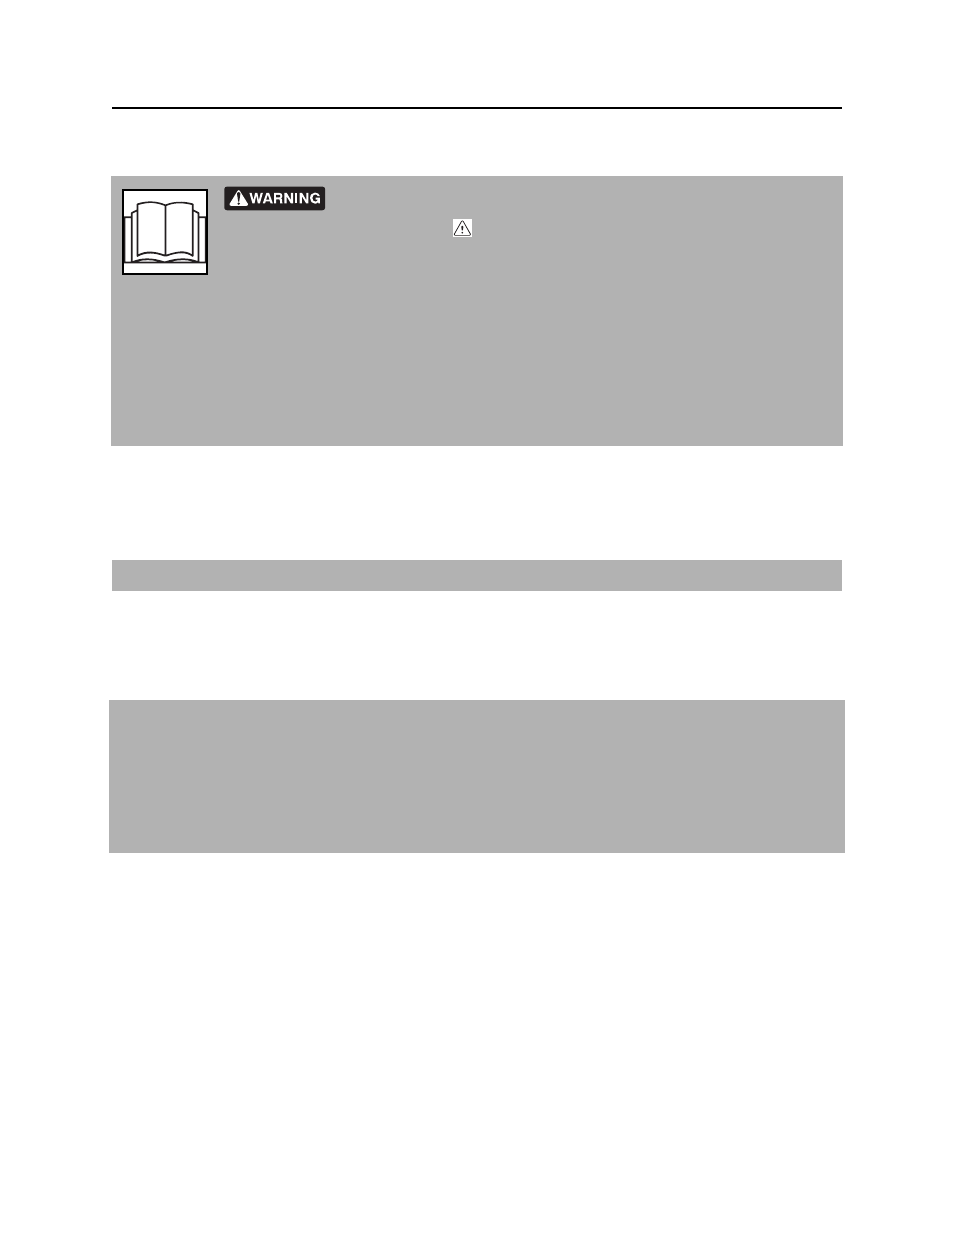 Service precautions, Cleaning precaution, Welding precaution | Ditch